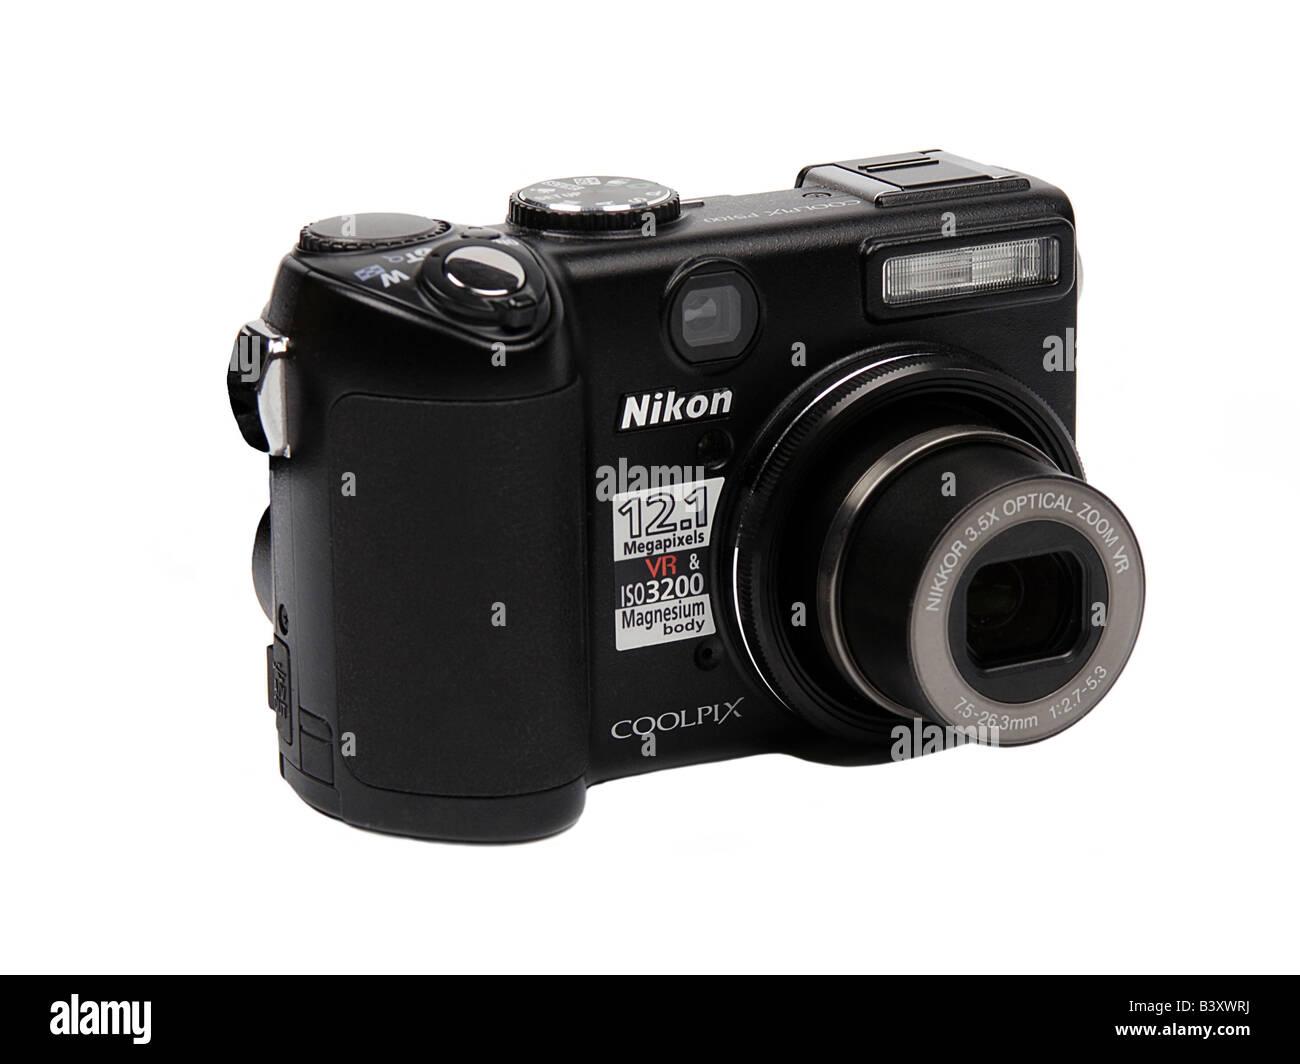 Nikon pocket Digital Camera - Stock Image